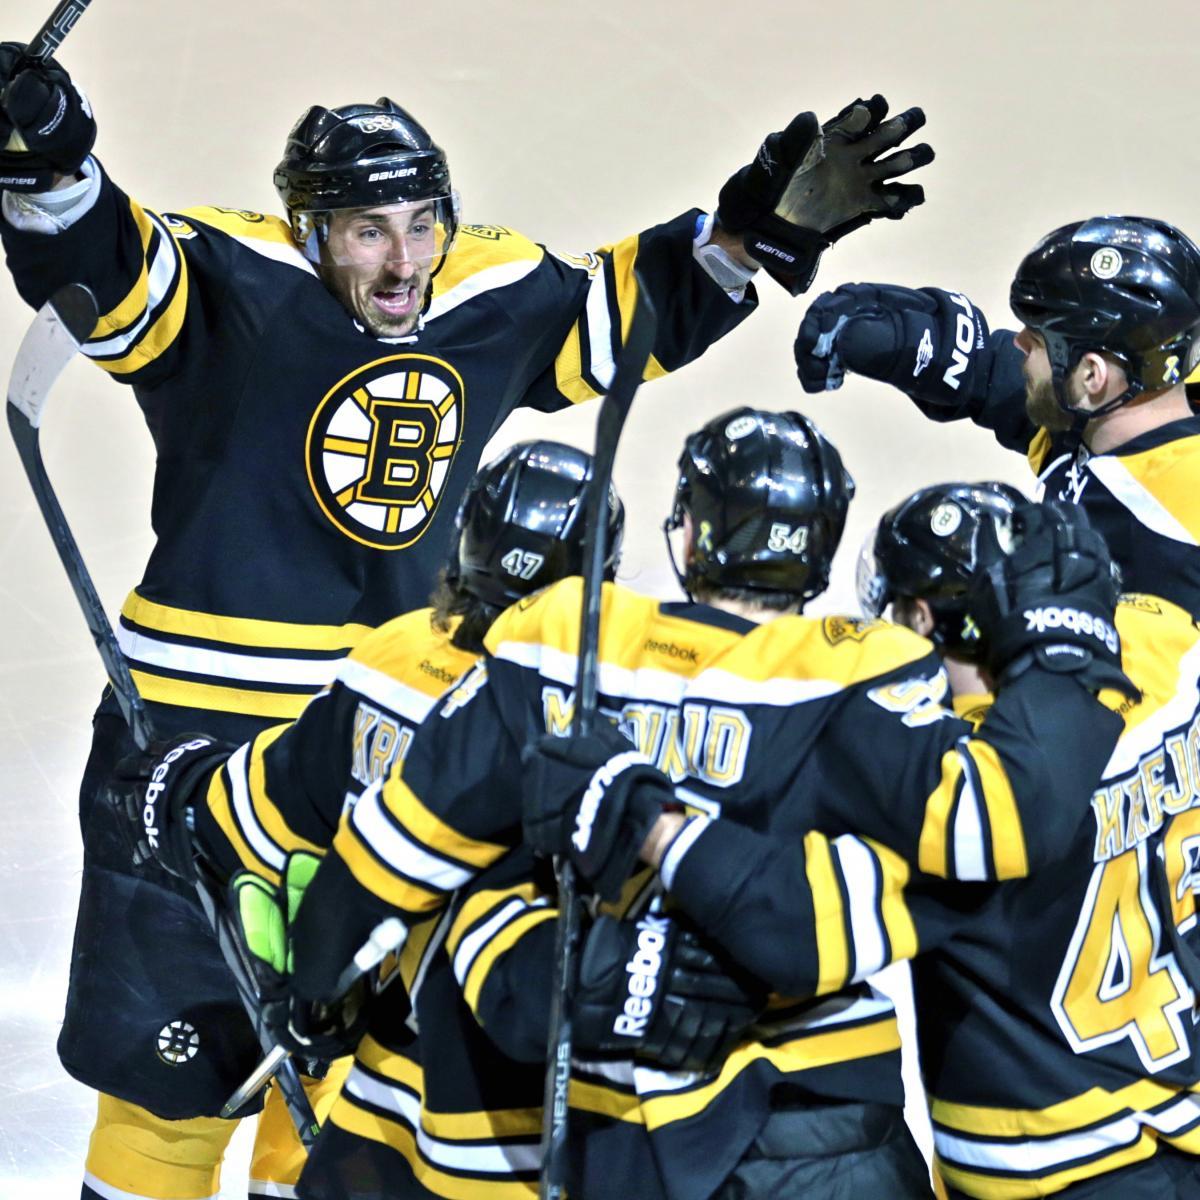 Pittsburgh Penguins Vs. Boston Bruins Game 4: Live Score